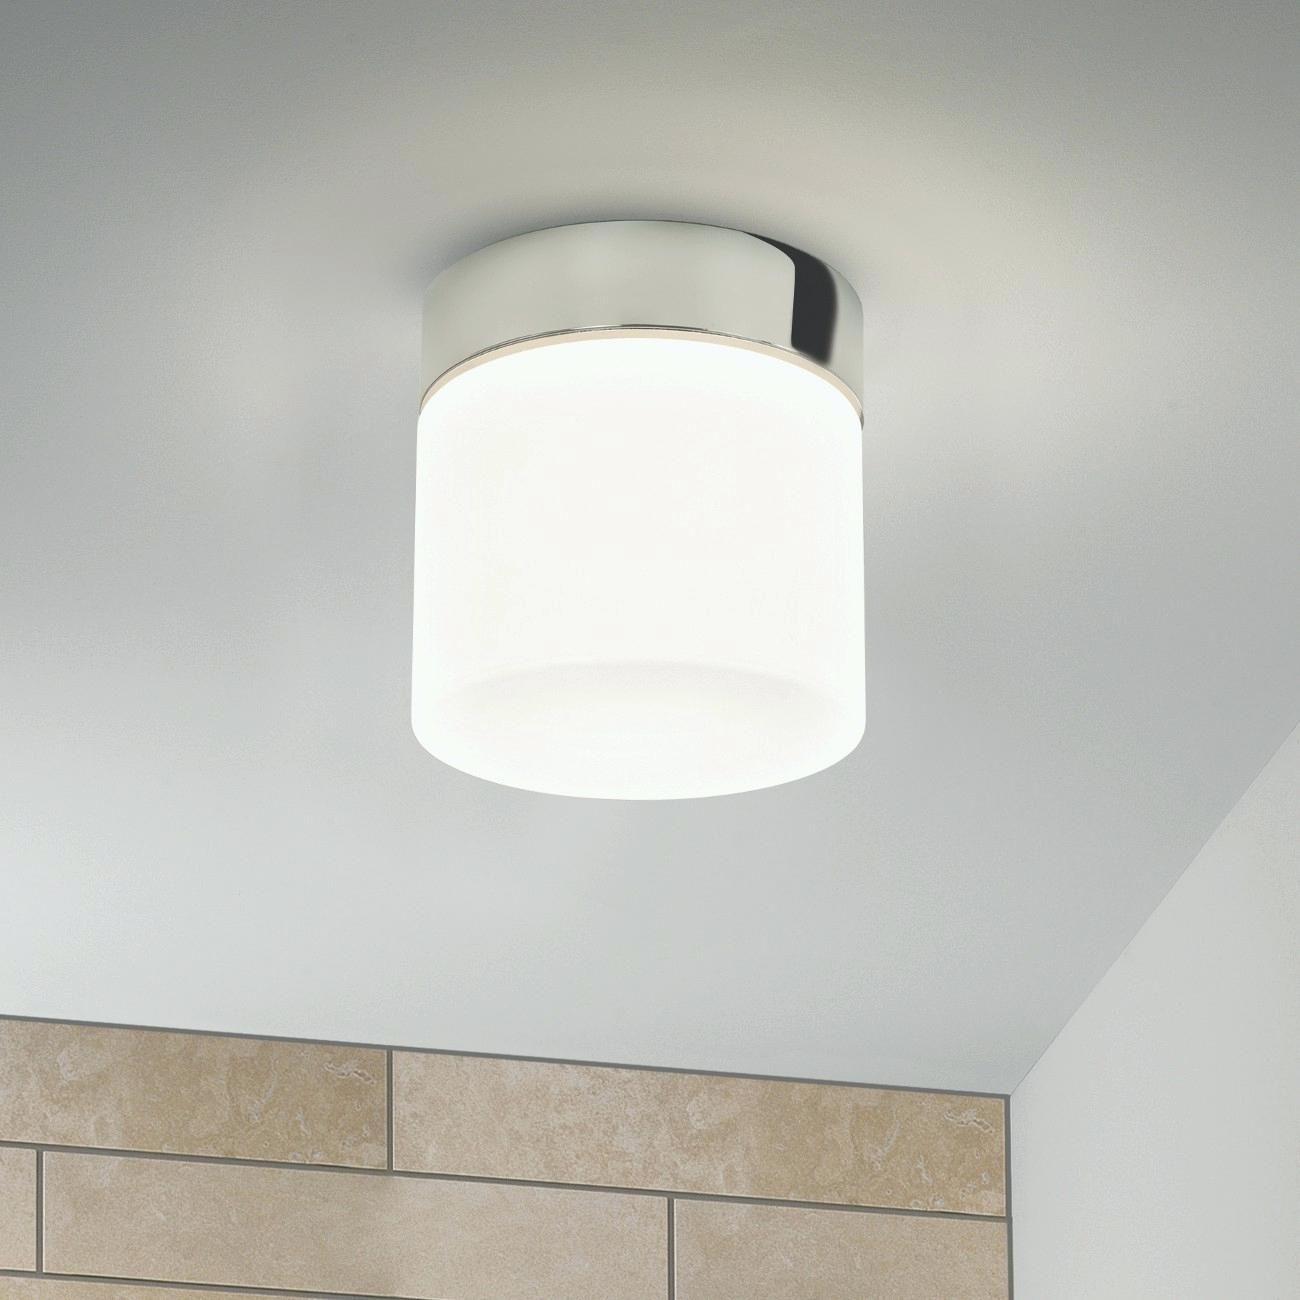 Badezimmer Lampe 120 Cm Lampe Spiegelschrank Full Size Puris